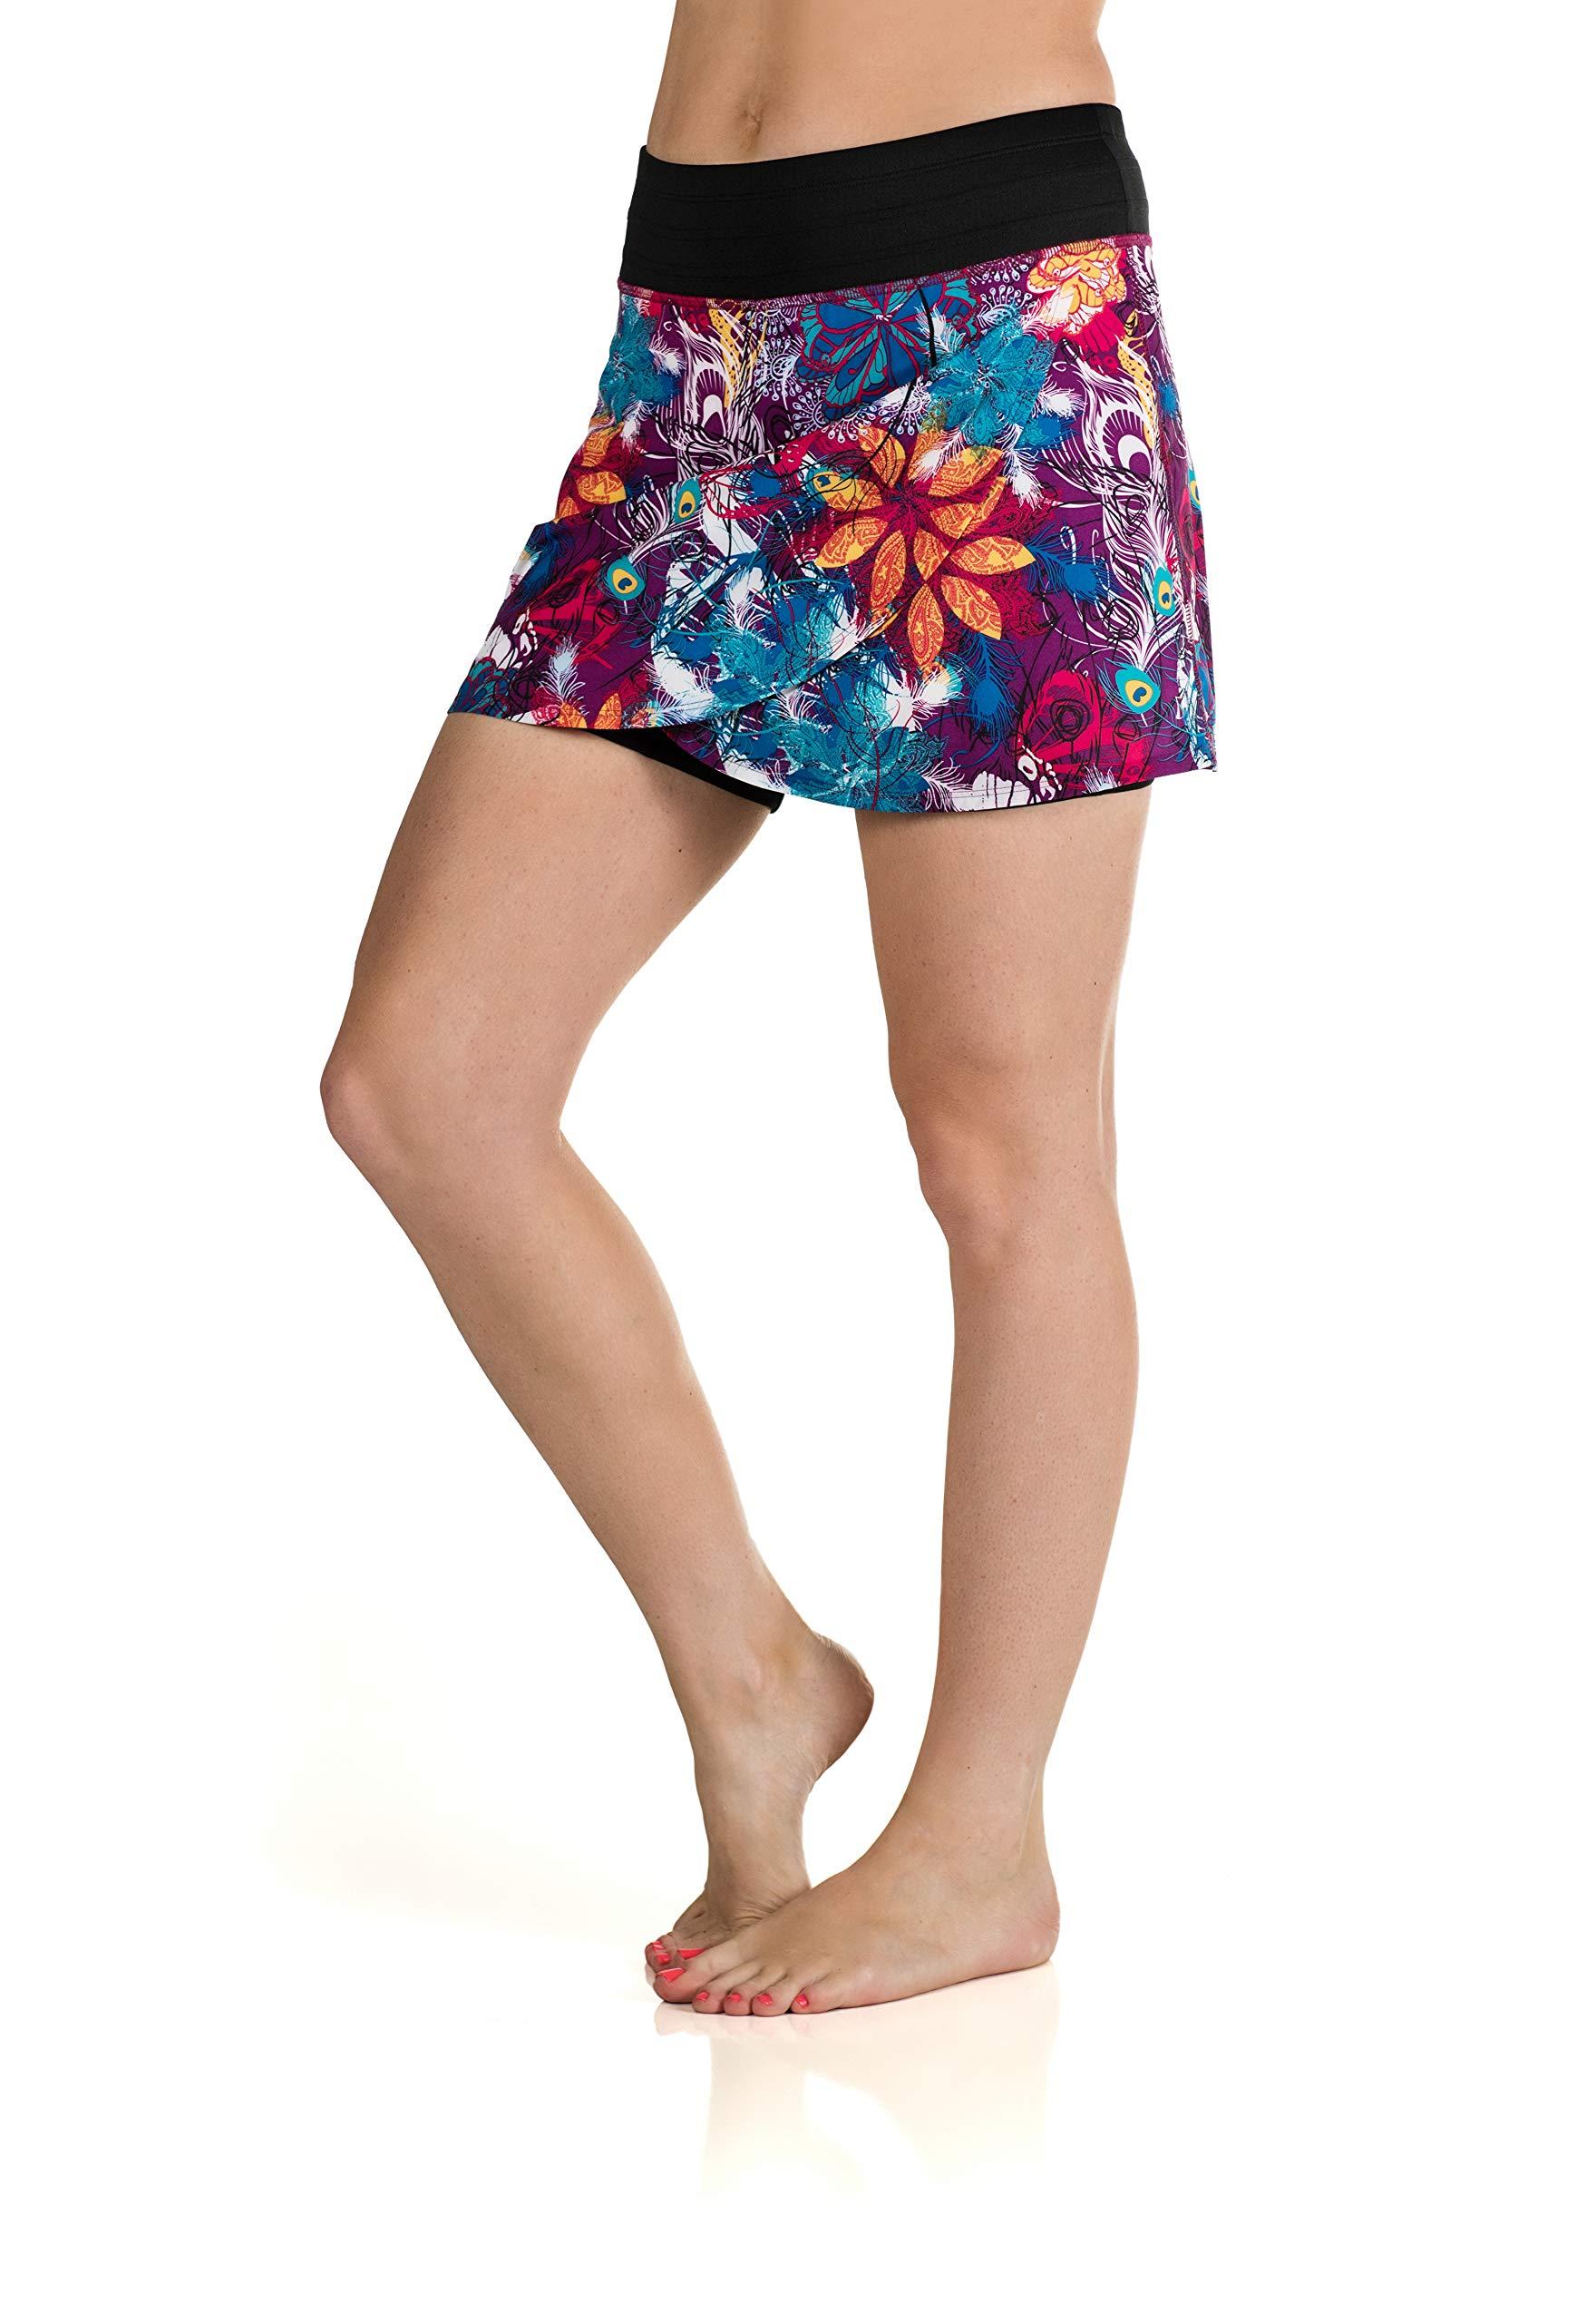 Skirt Sports Women's Hover Skirt, Tempered Tantrum Print, X-Large by Skirt Sports